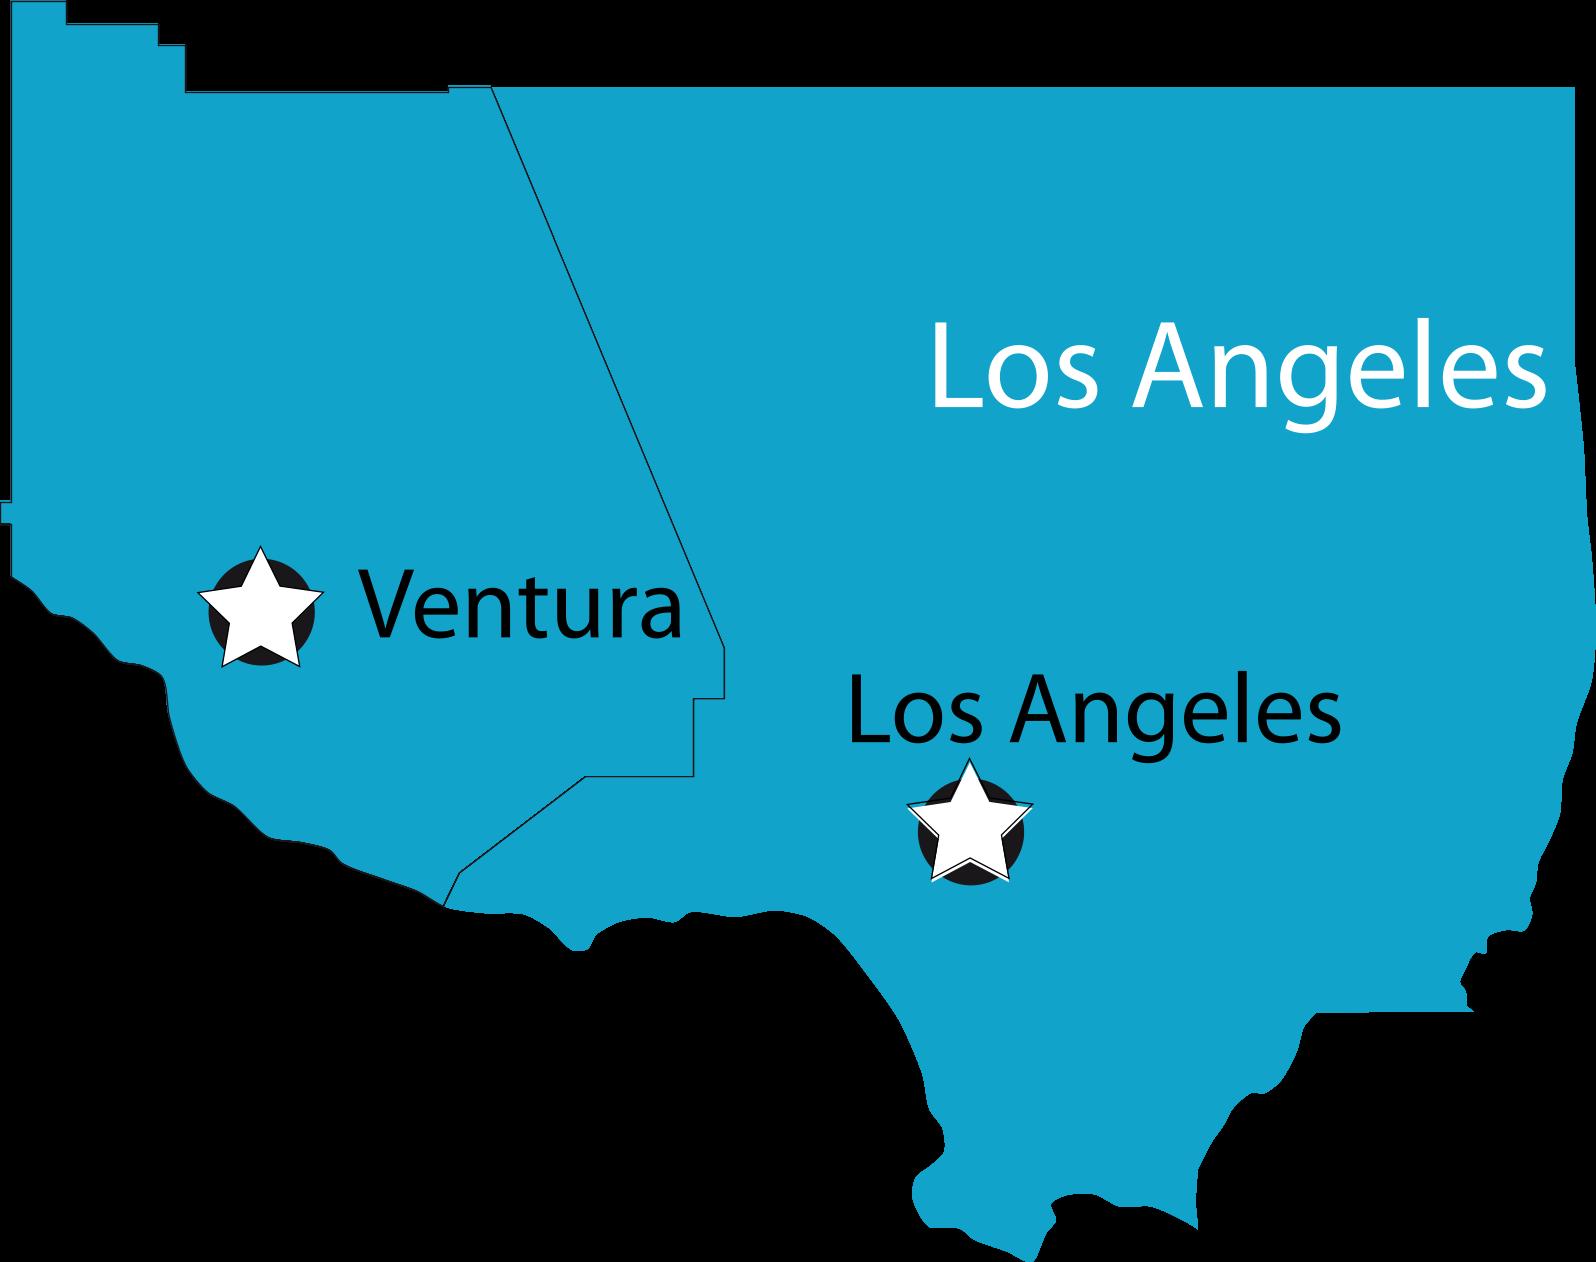 ventura and los angeles map